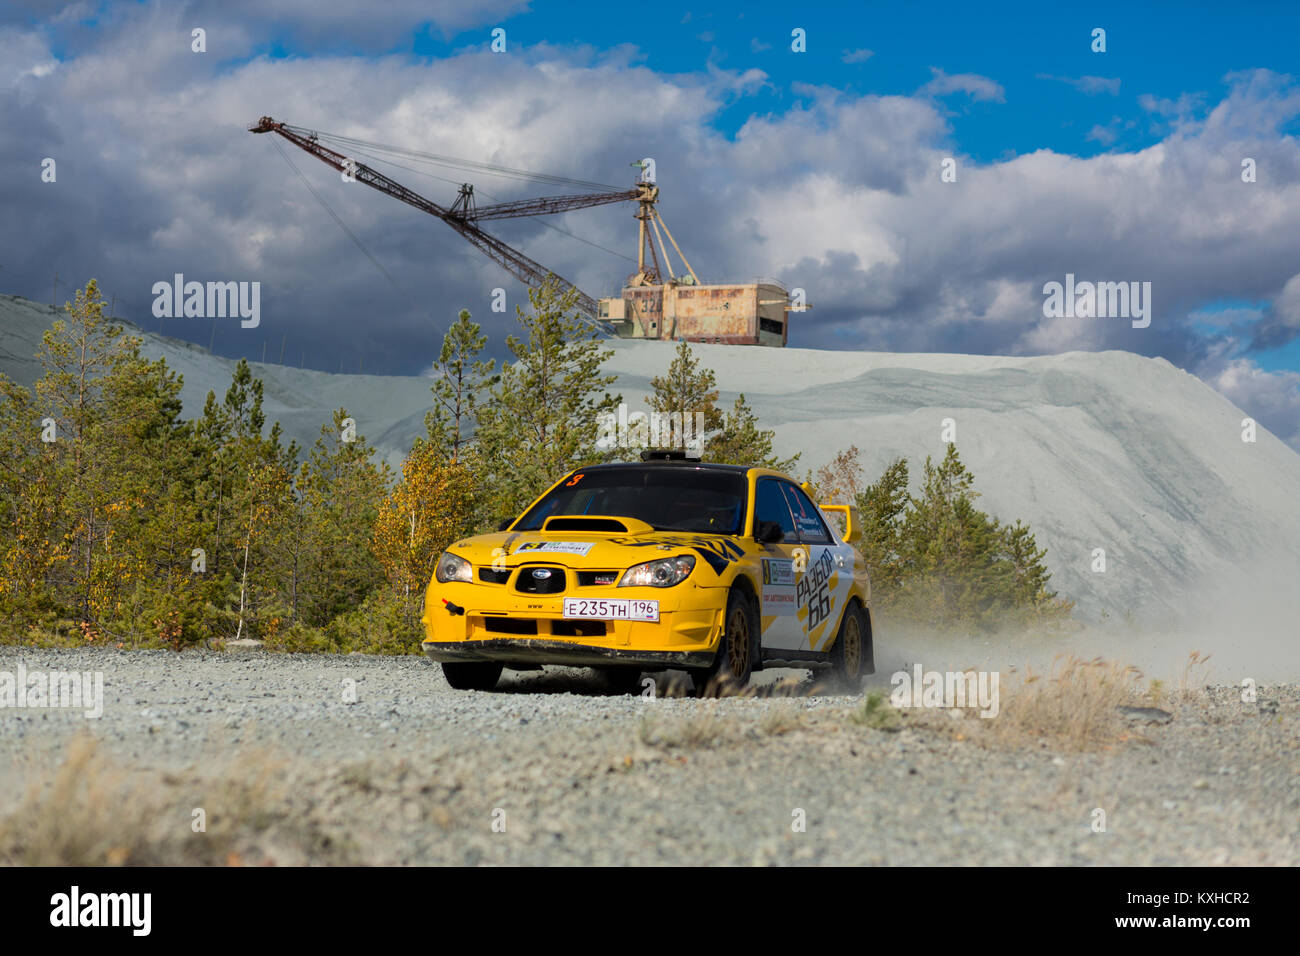 Asbest, Russland, September 17, 2017 - 16 Phase der Russischen Cup rally'S 2017 tilobite 2017', Subaru Impreza Stockbild